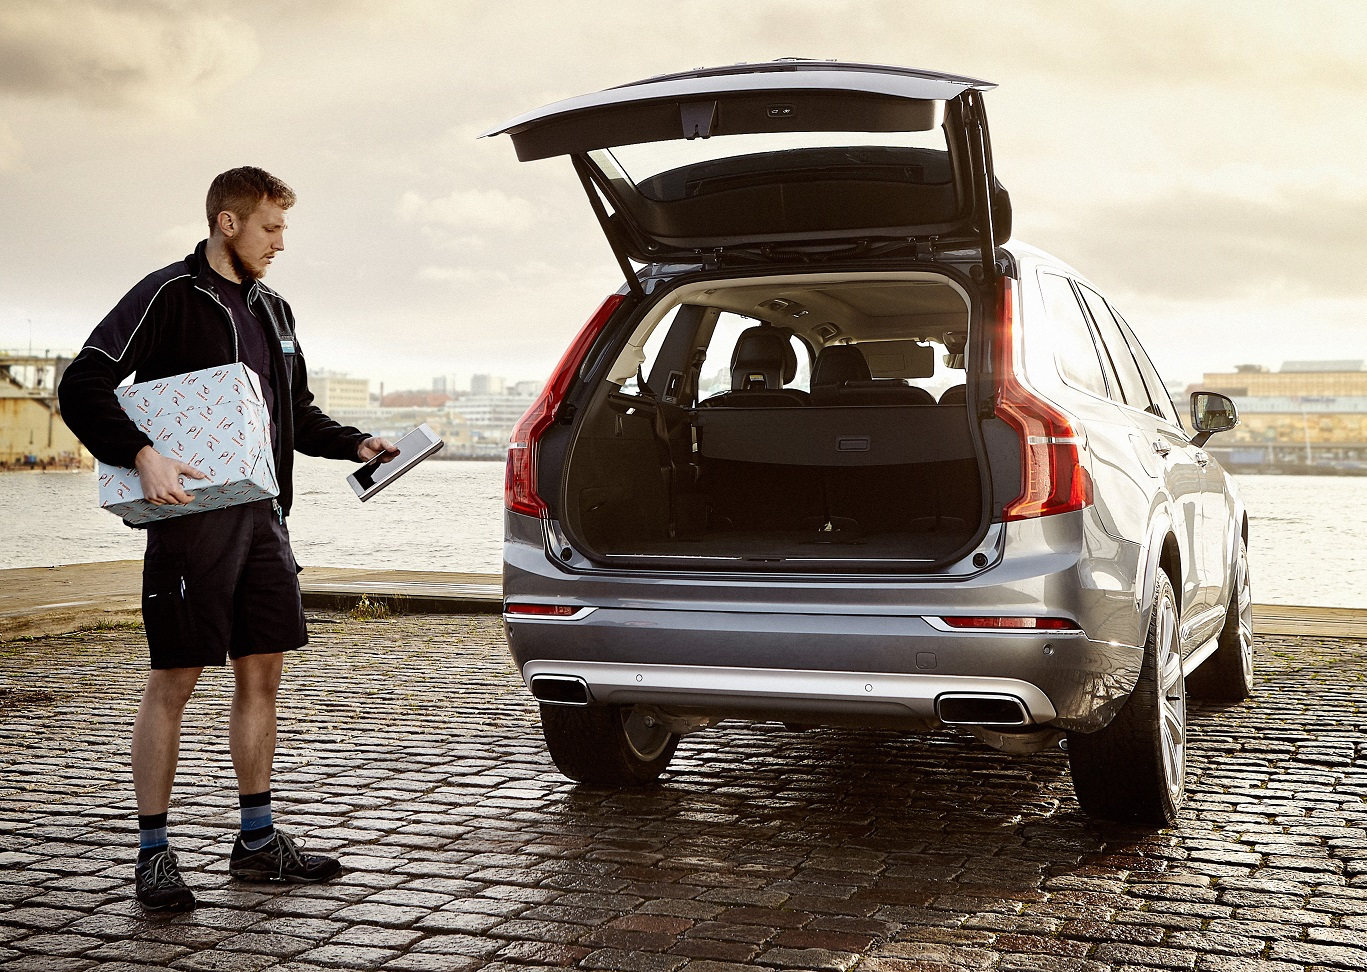 VOLVO IN CAR%2BDELIVERY%2BSERVICE 3 Η Volvo κάνει... delivery στο πόρτ μπαγκάζ σου Idea, Volvo, Volvo Cars